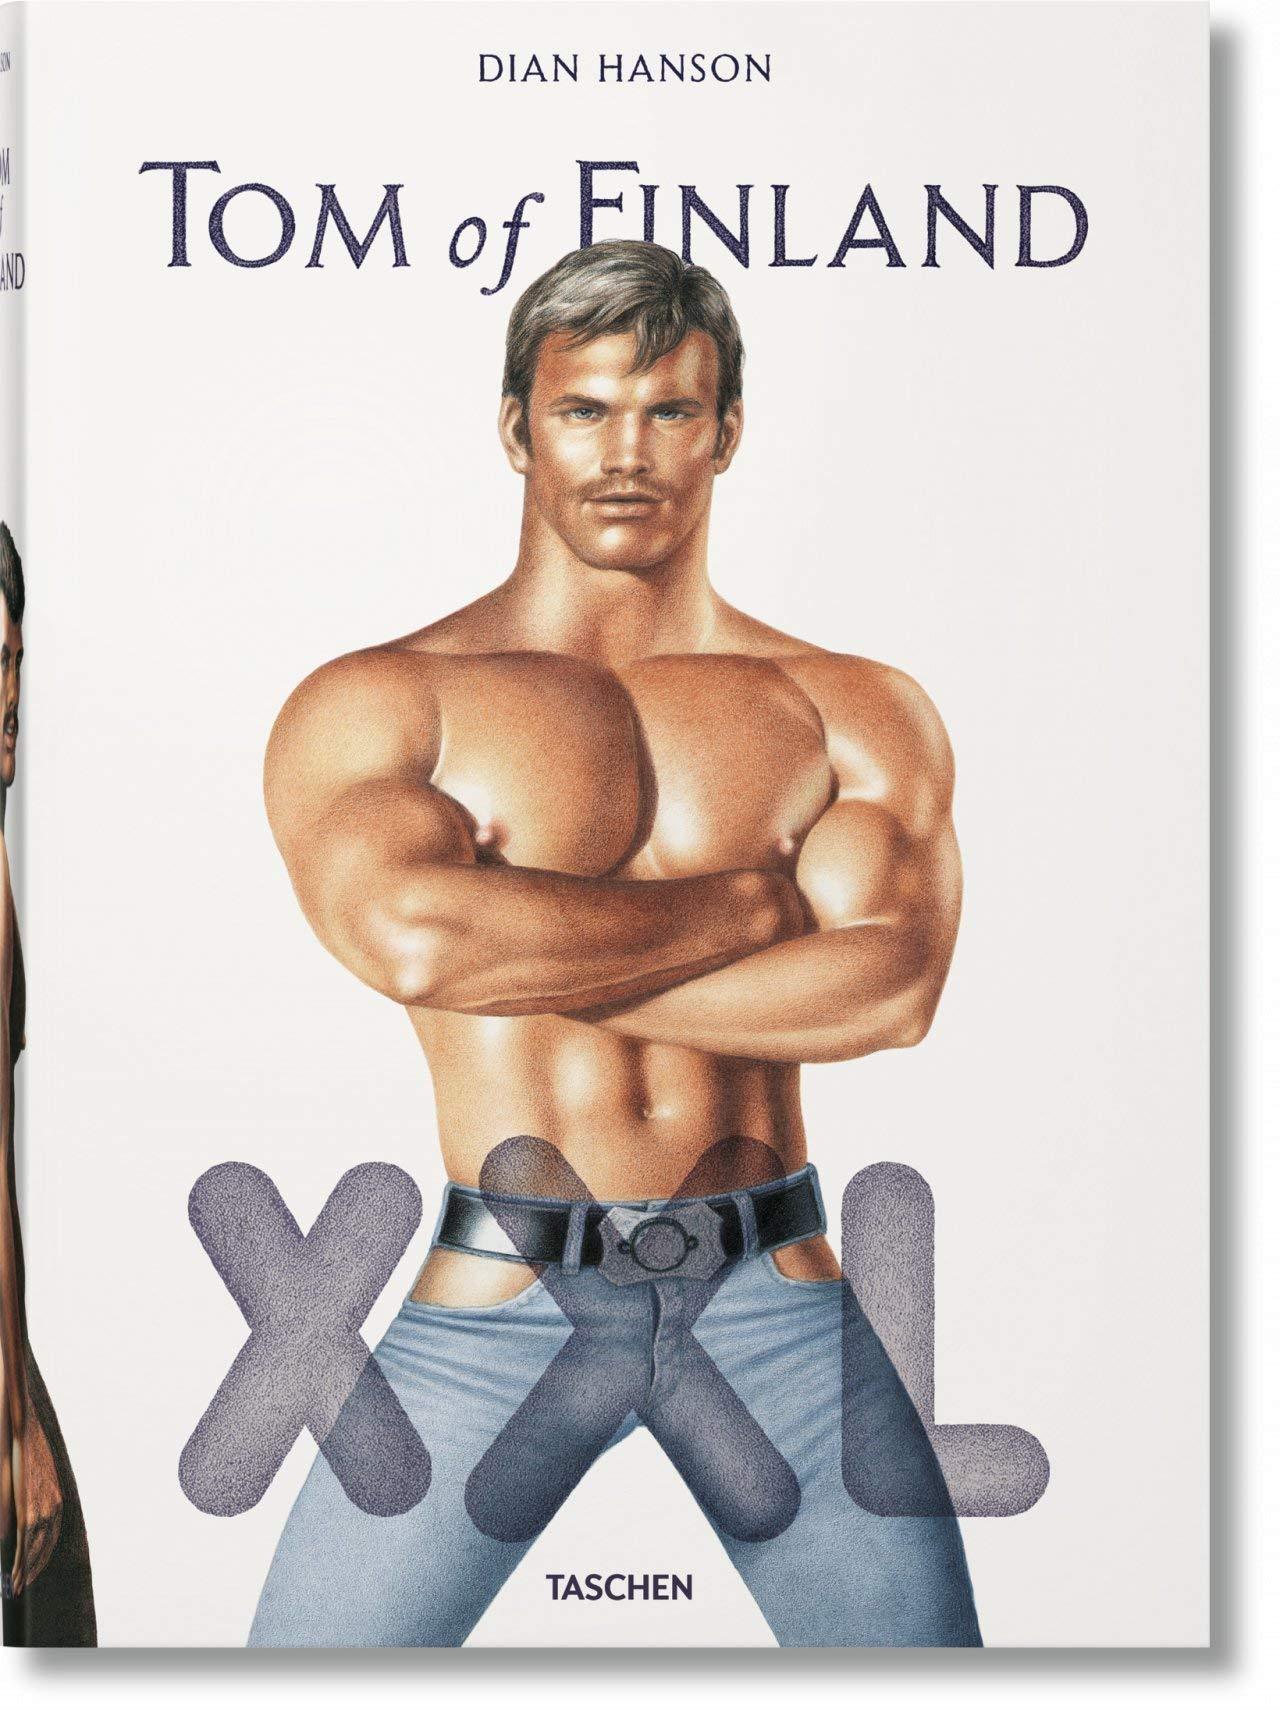 Tom of Finland XXL (Multilingual Edition) by Hanson Dian